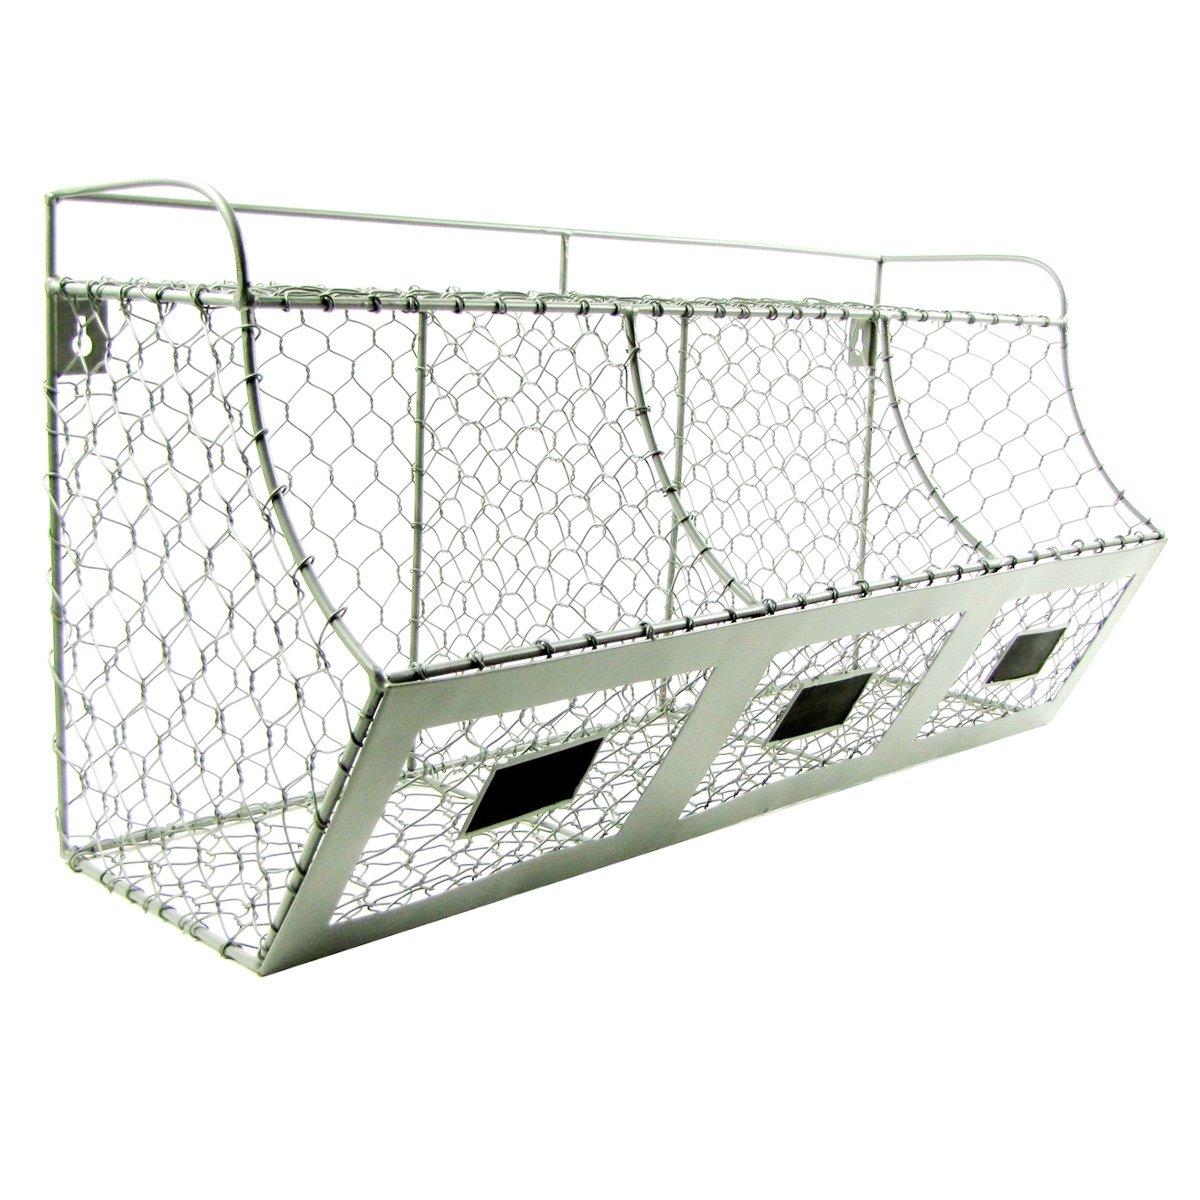 Amazon.com: Rustic Chicken Wire Wall Storage 3 Bin Basket ...